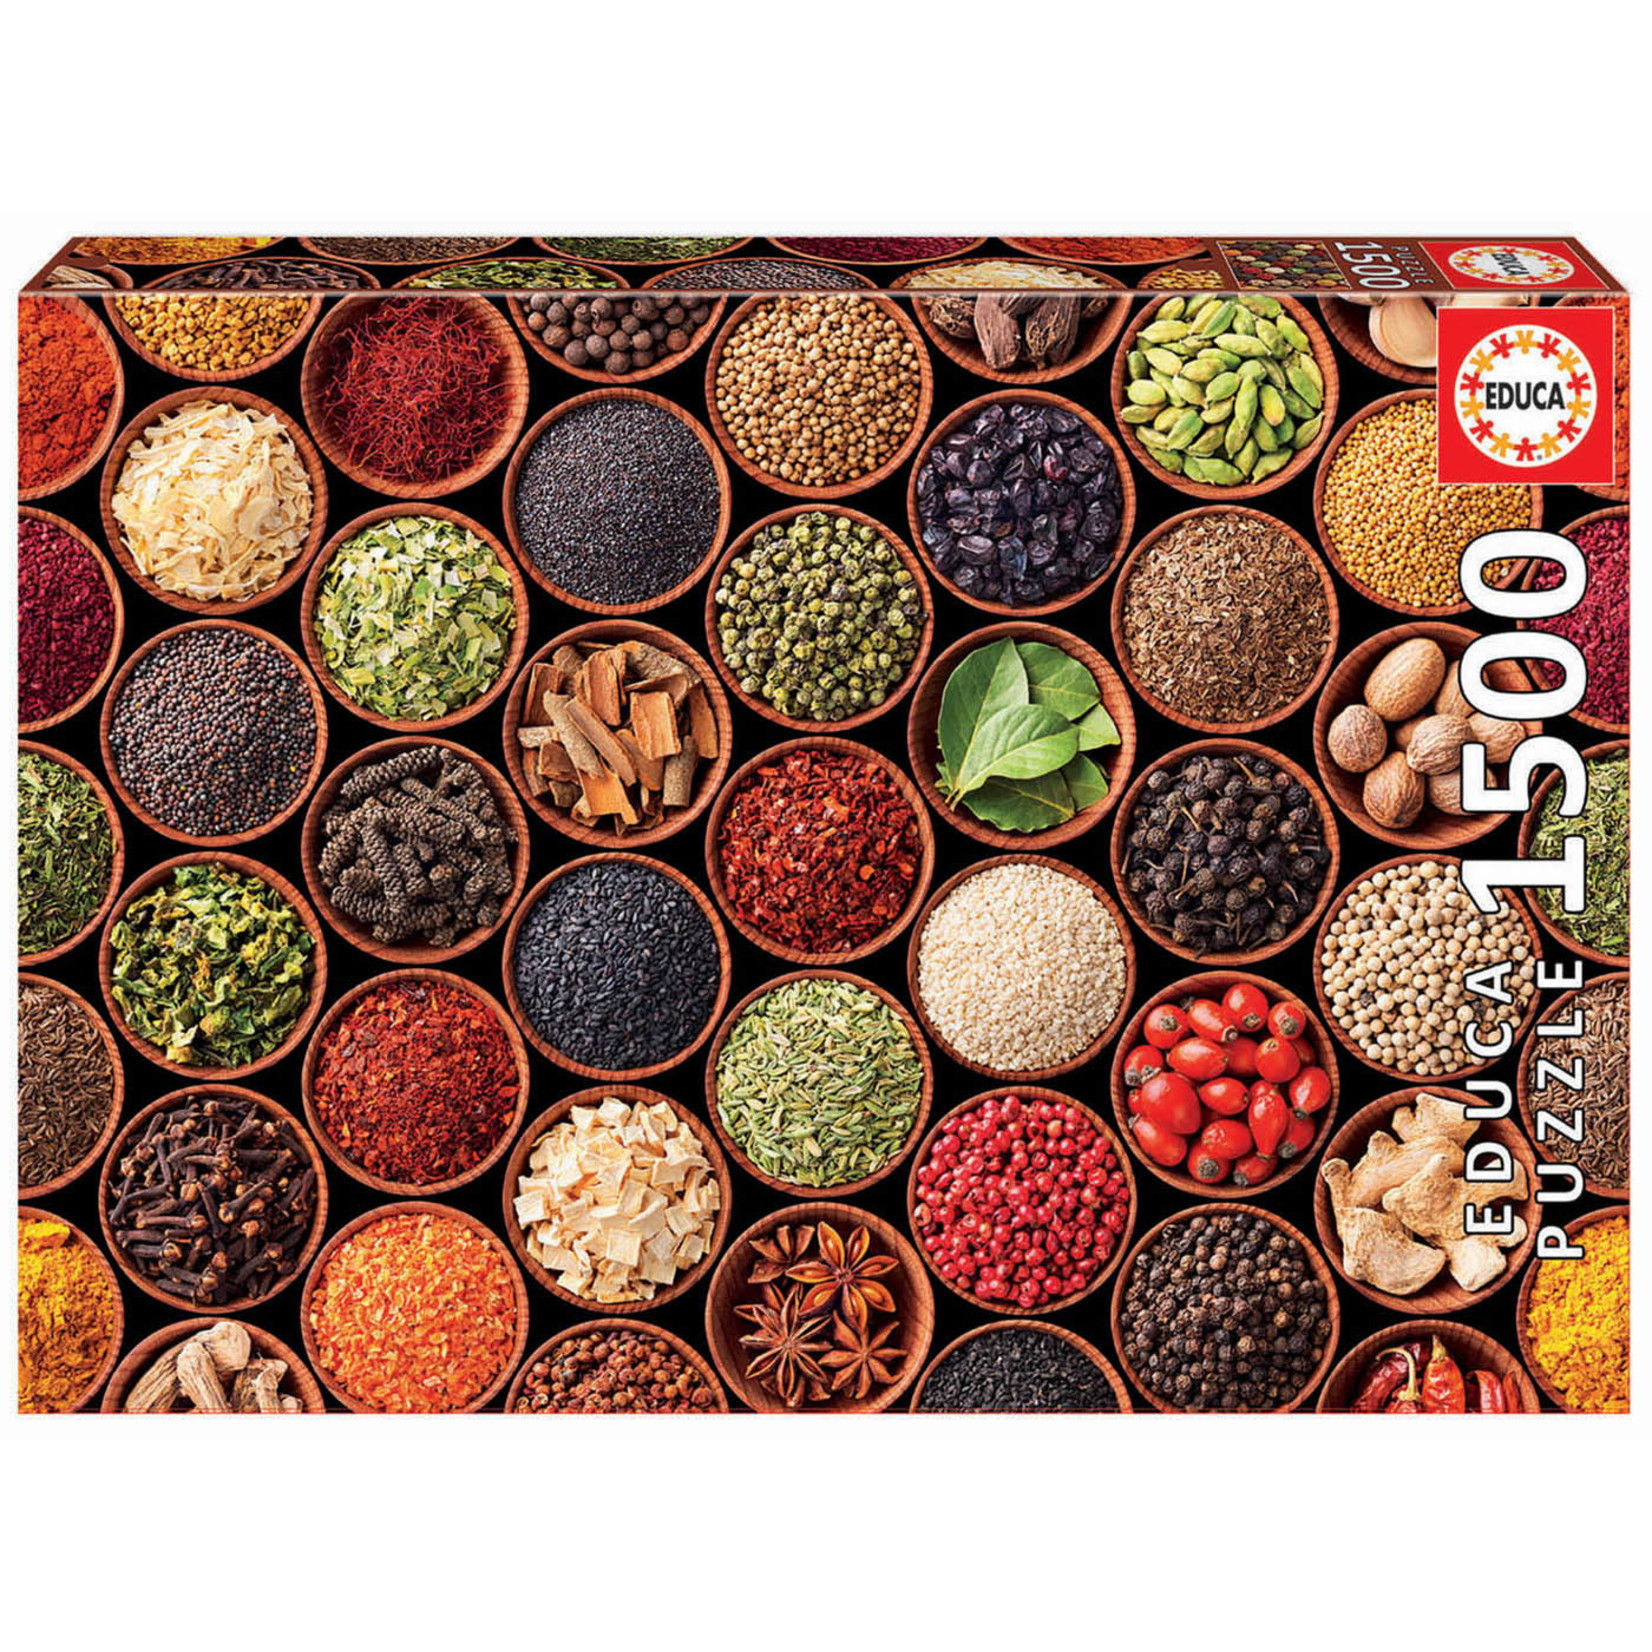 Educa Puzzles Herbs & Spices 1500pc